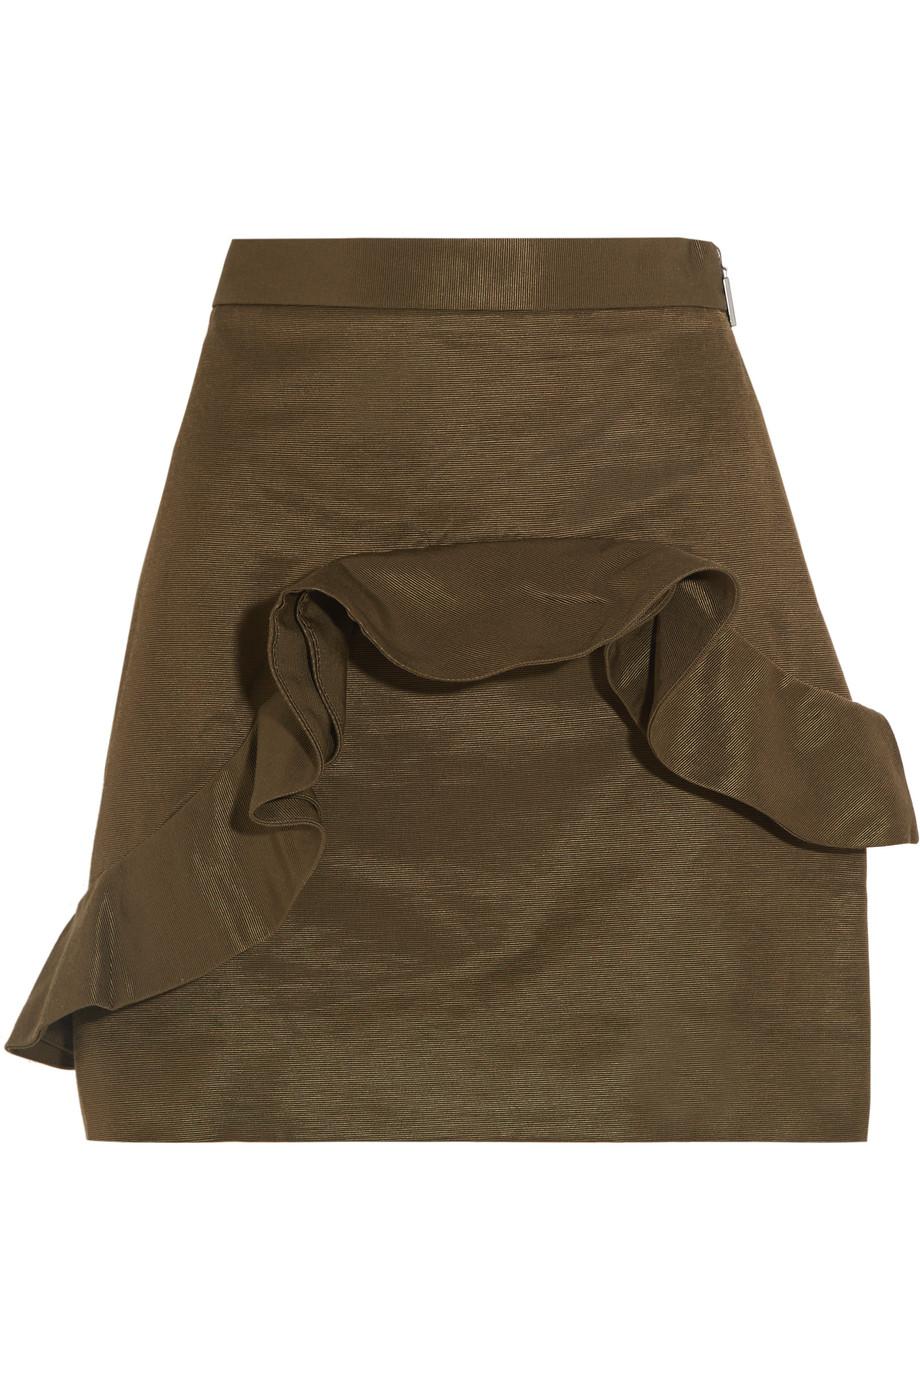 MSGM Ruffled Cotton-Blend Faille Mini Skirt, Army Green, Women's, Size: 38